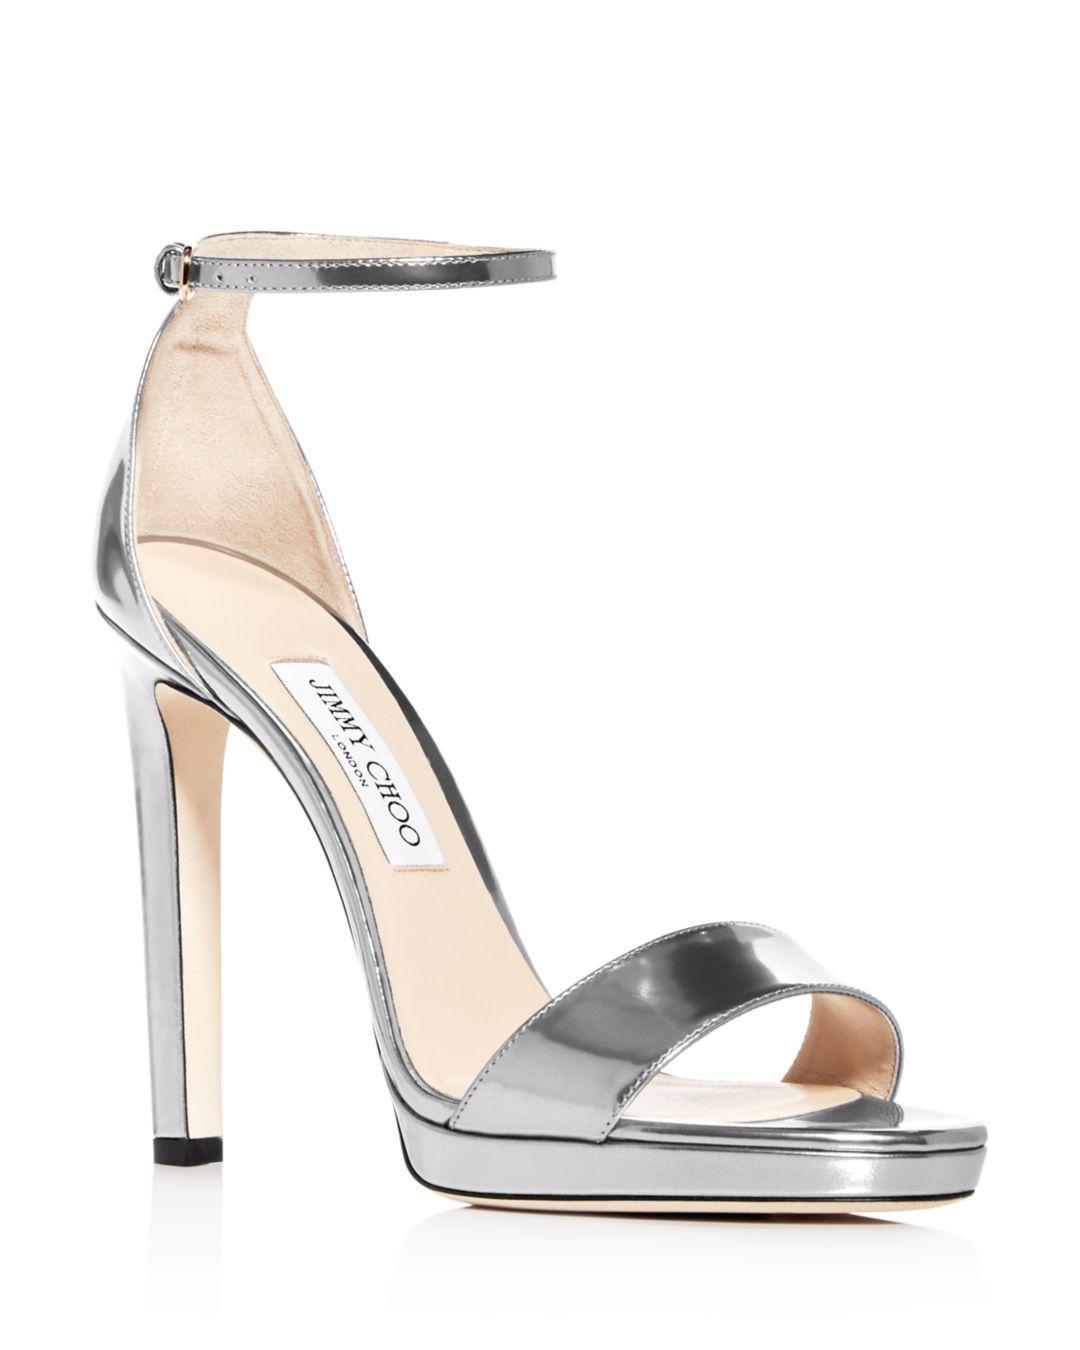 27c2a0c6fb8 Lyst - Jimmy Choo Women s Misty 120 Ankle Strap High-heel Sandals in ...